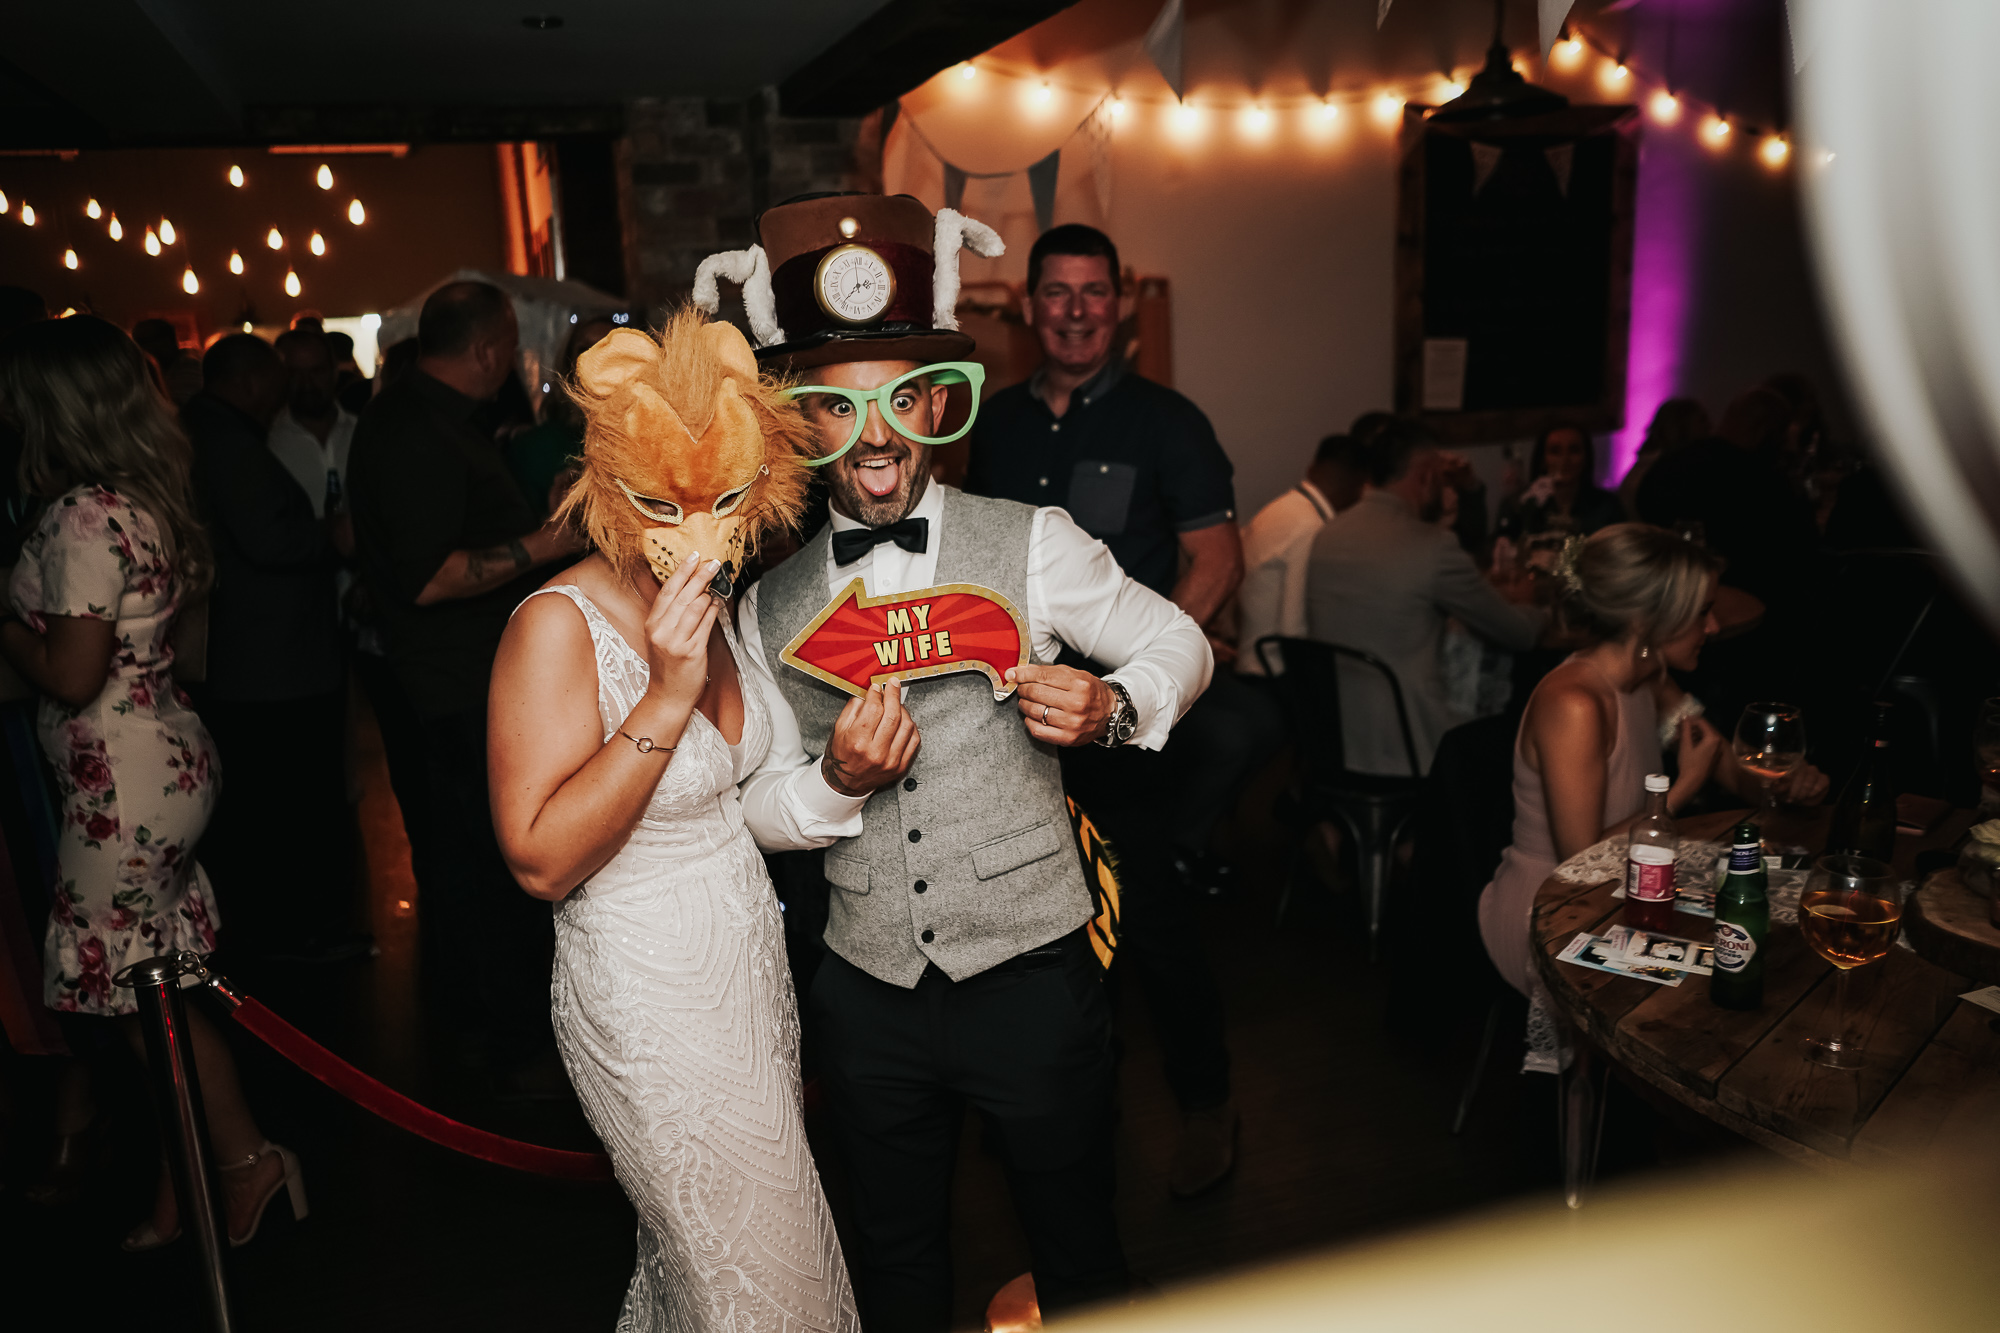 The Hayloft Wedding Photography Cheshire wedding photographer (52 of 52).jpg